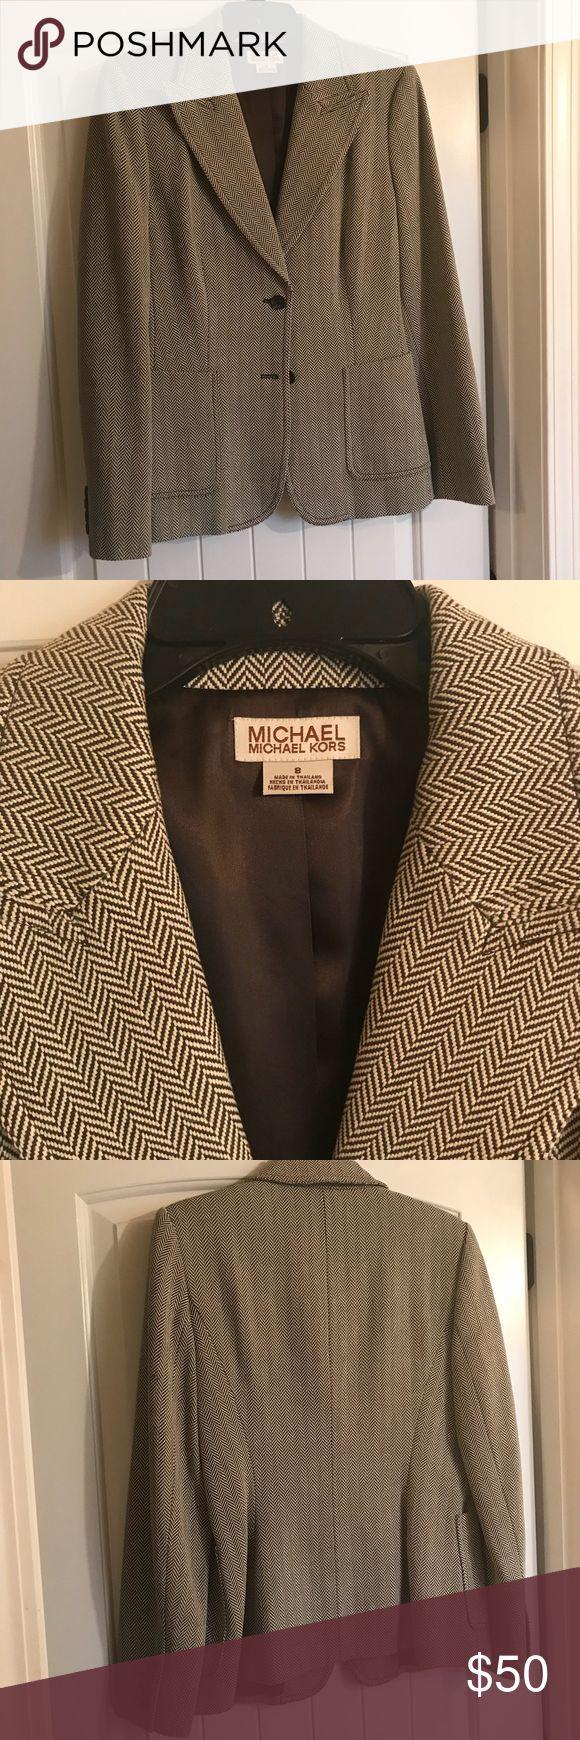 "Michael Kors Brown/cream suit. Jacket 8 pants 6 EUC Michael Kors two piece skirt suit. Brown/cream jacket is size 8 skirt is size 6. Jacket has two front pockets skirt is 20"" long Michael Kors Other"